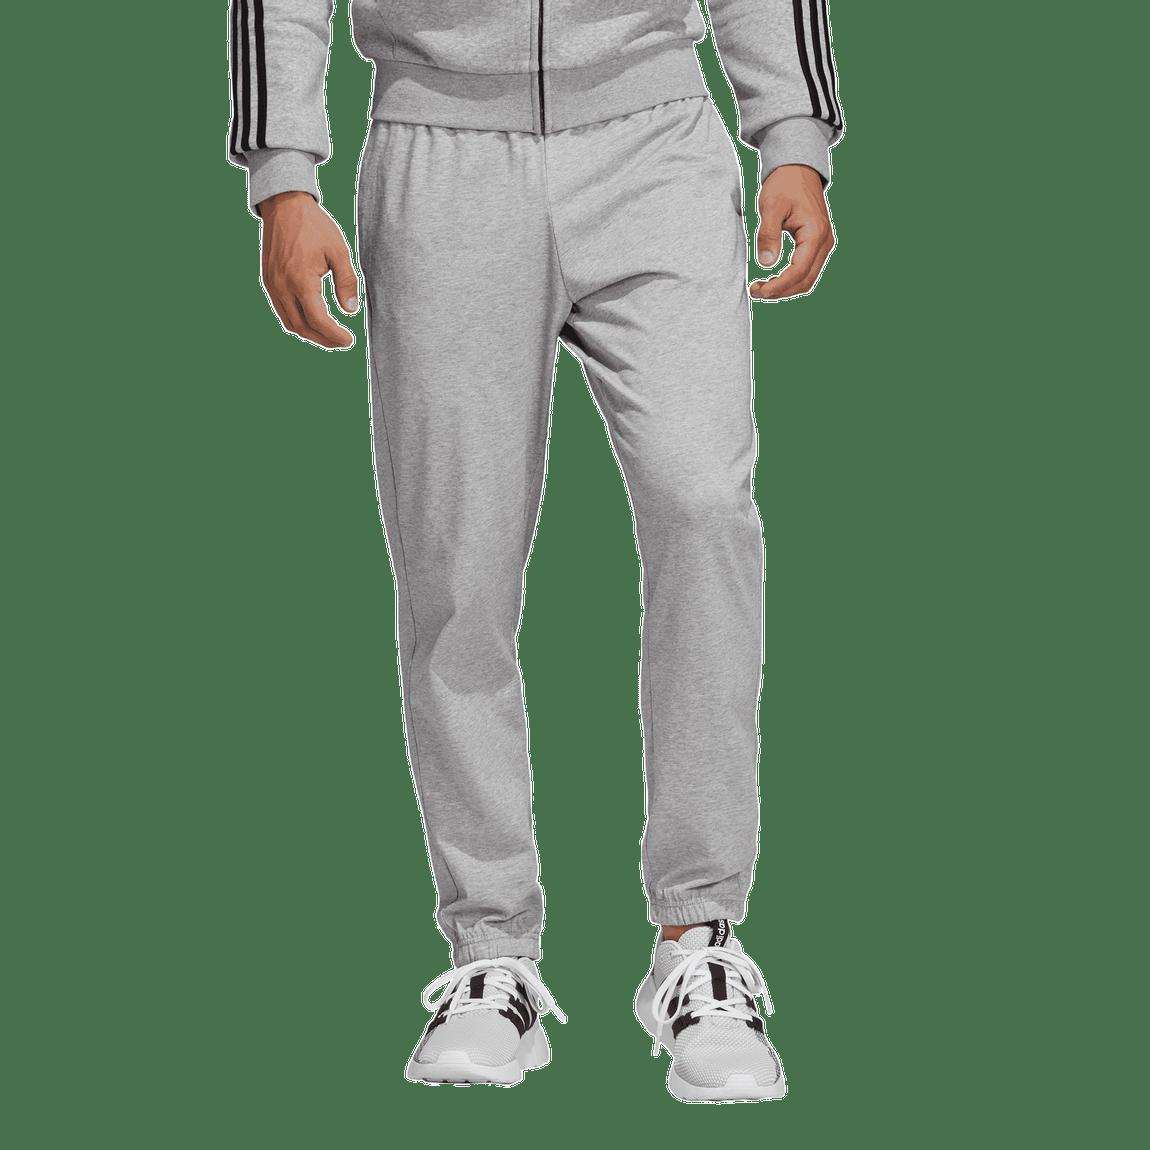 size 40 87a82 5e2c0 Pantalón Adidas Fitness Essentials Linear